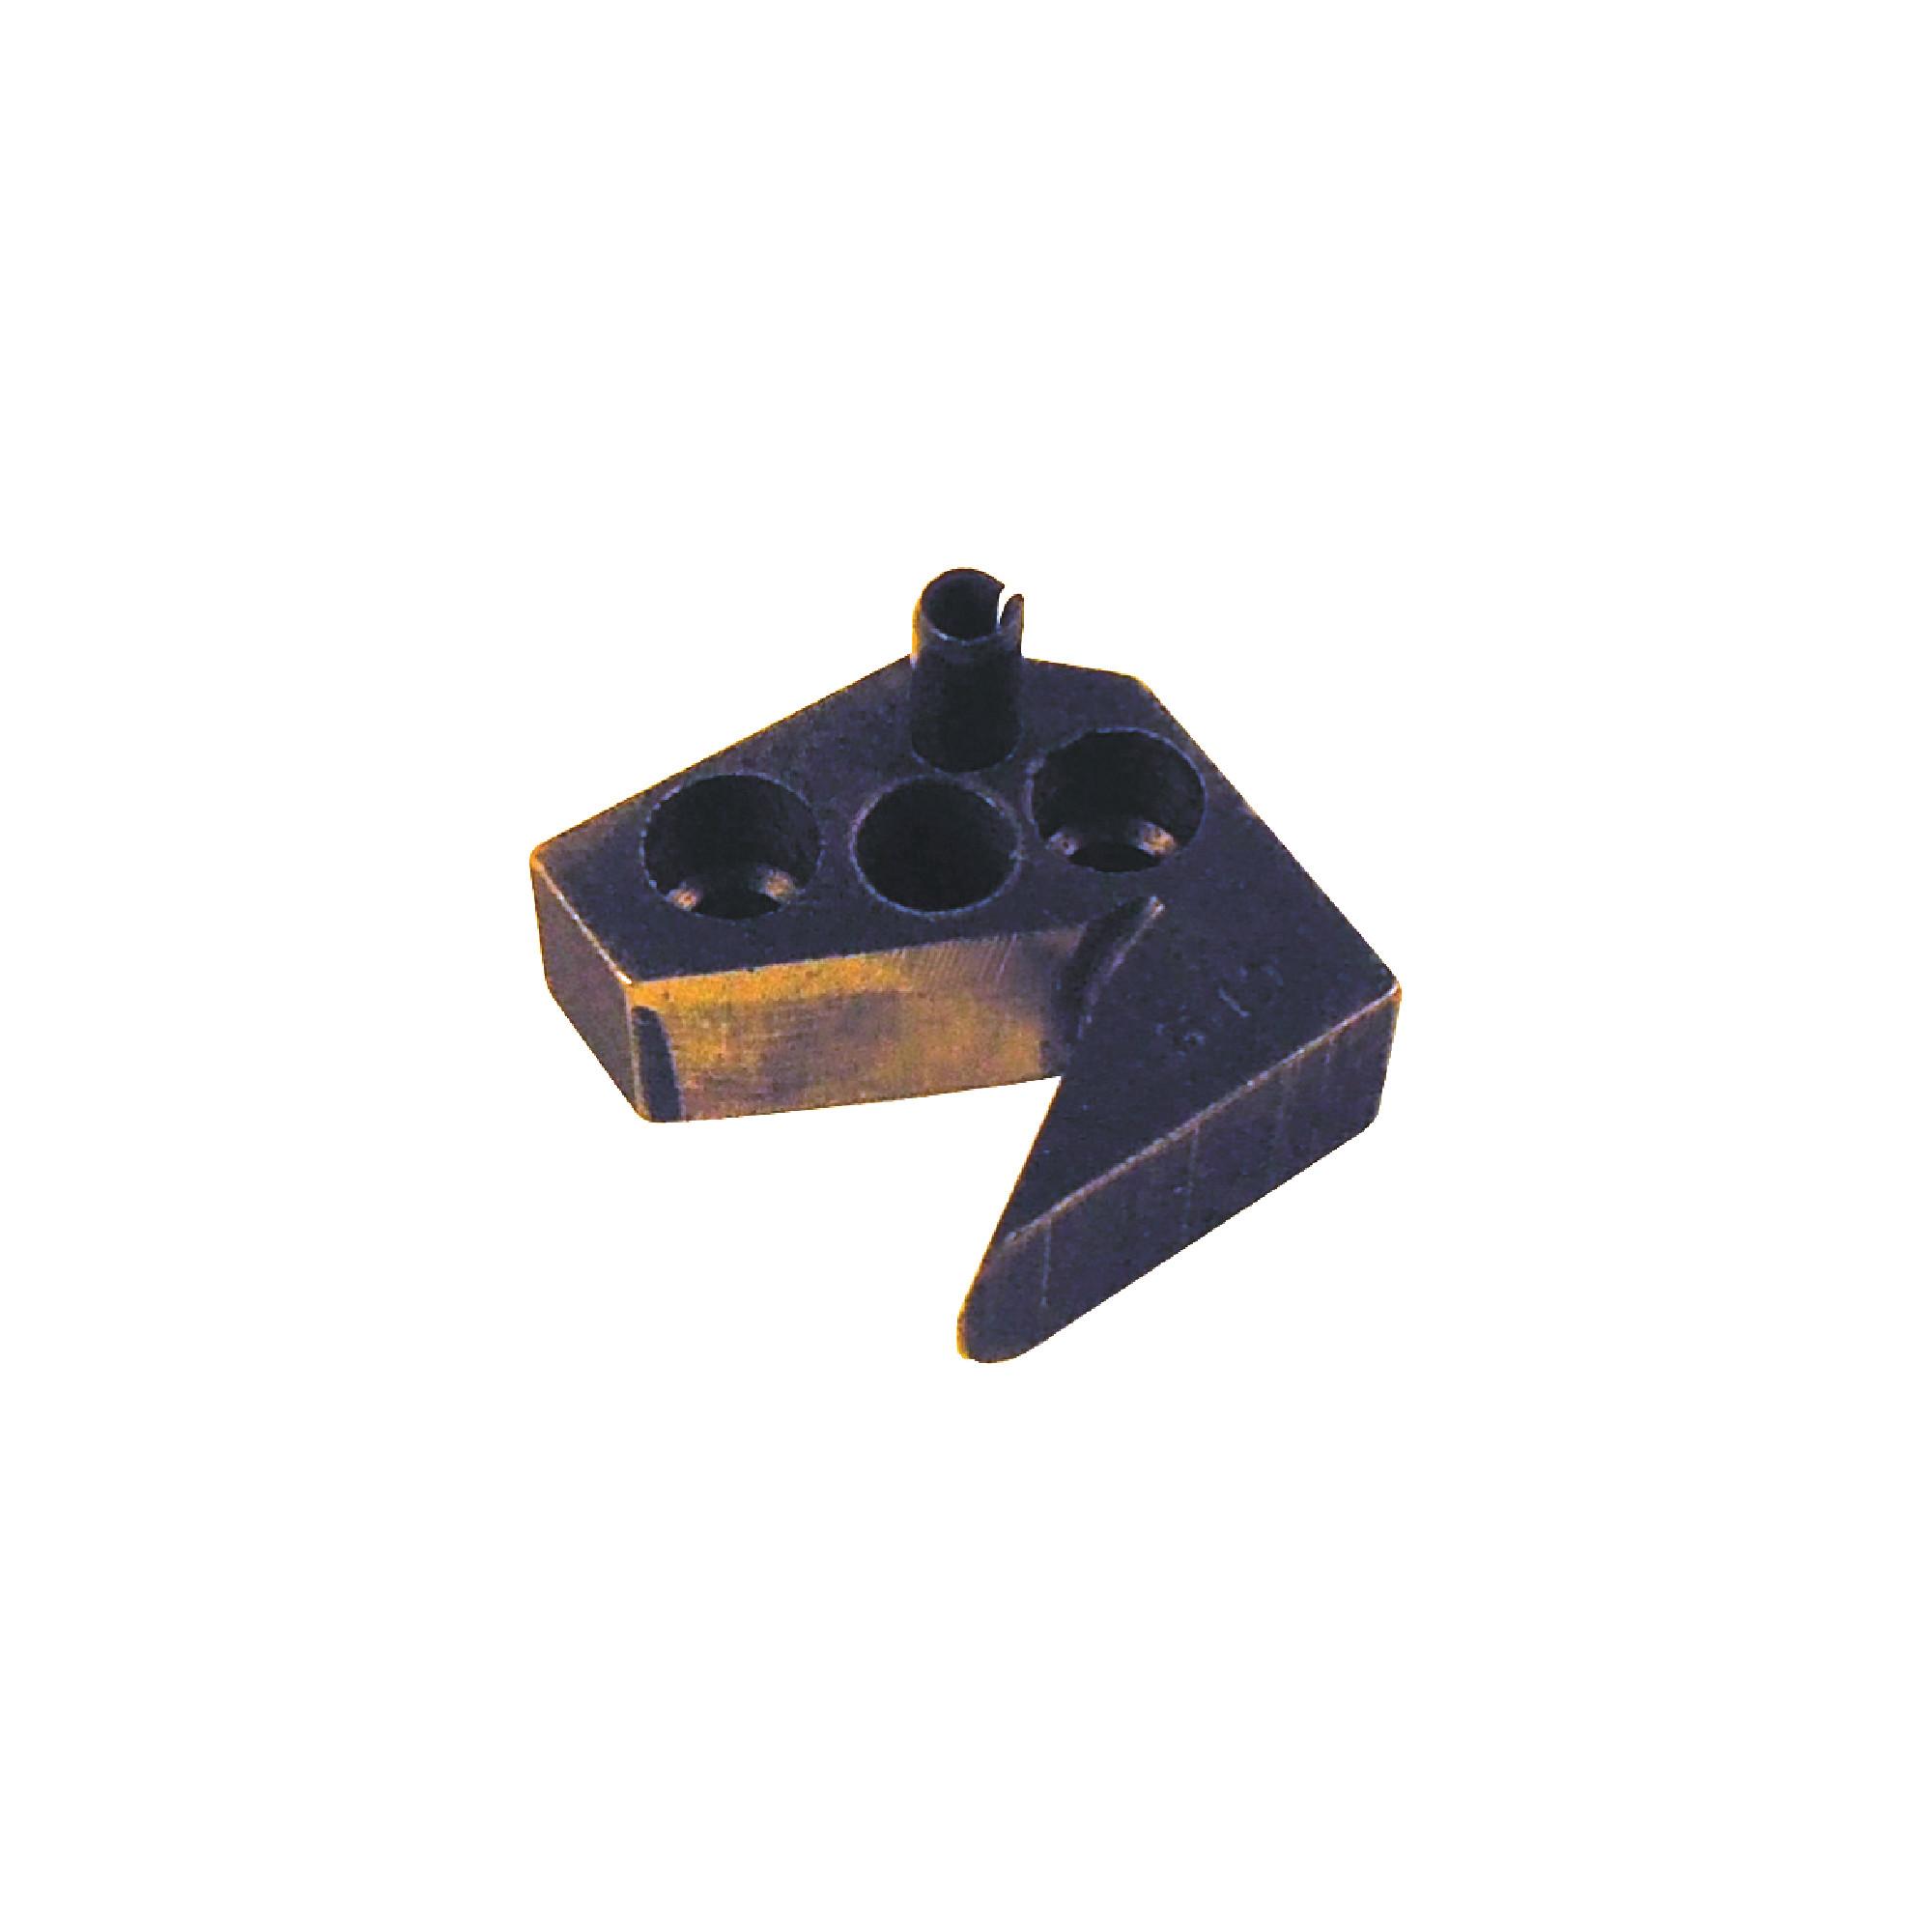 APT - CP-5 / Replacable Cartredge for Tri-Lead Boring Bar